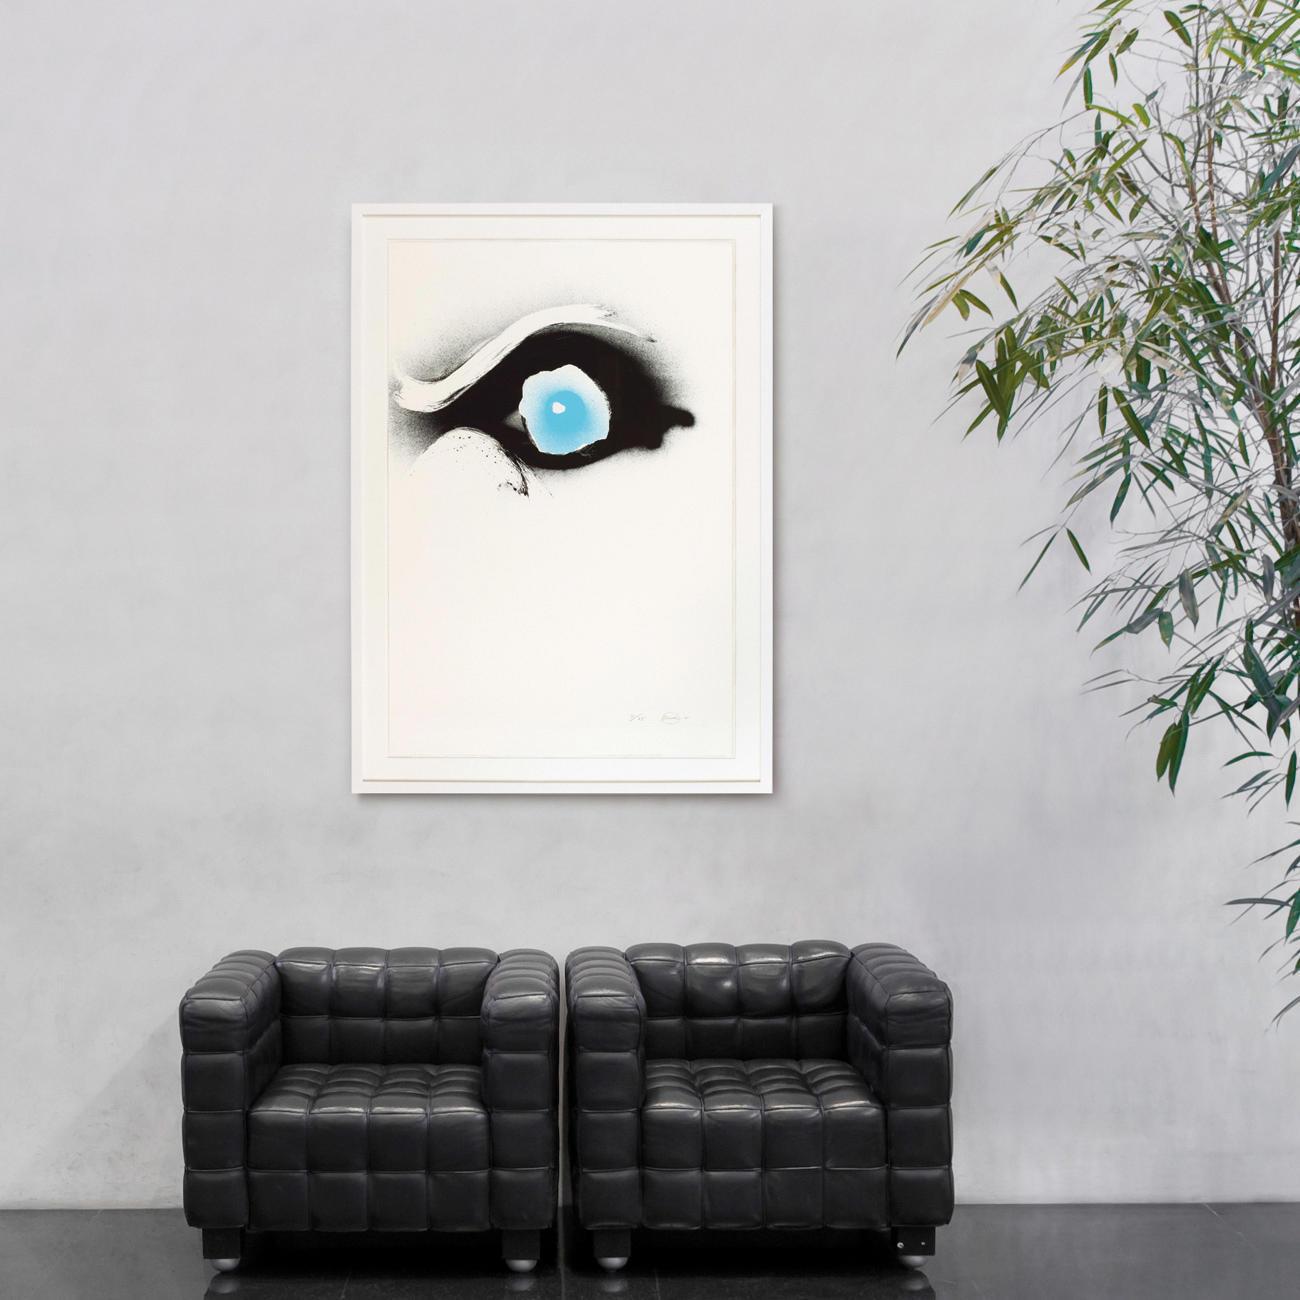 otto piene seuloeil kaufen pro idee kunstformat. Black Bedroom Furniture Sets. Home Design Ideas